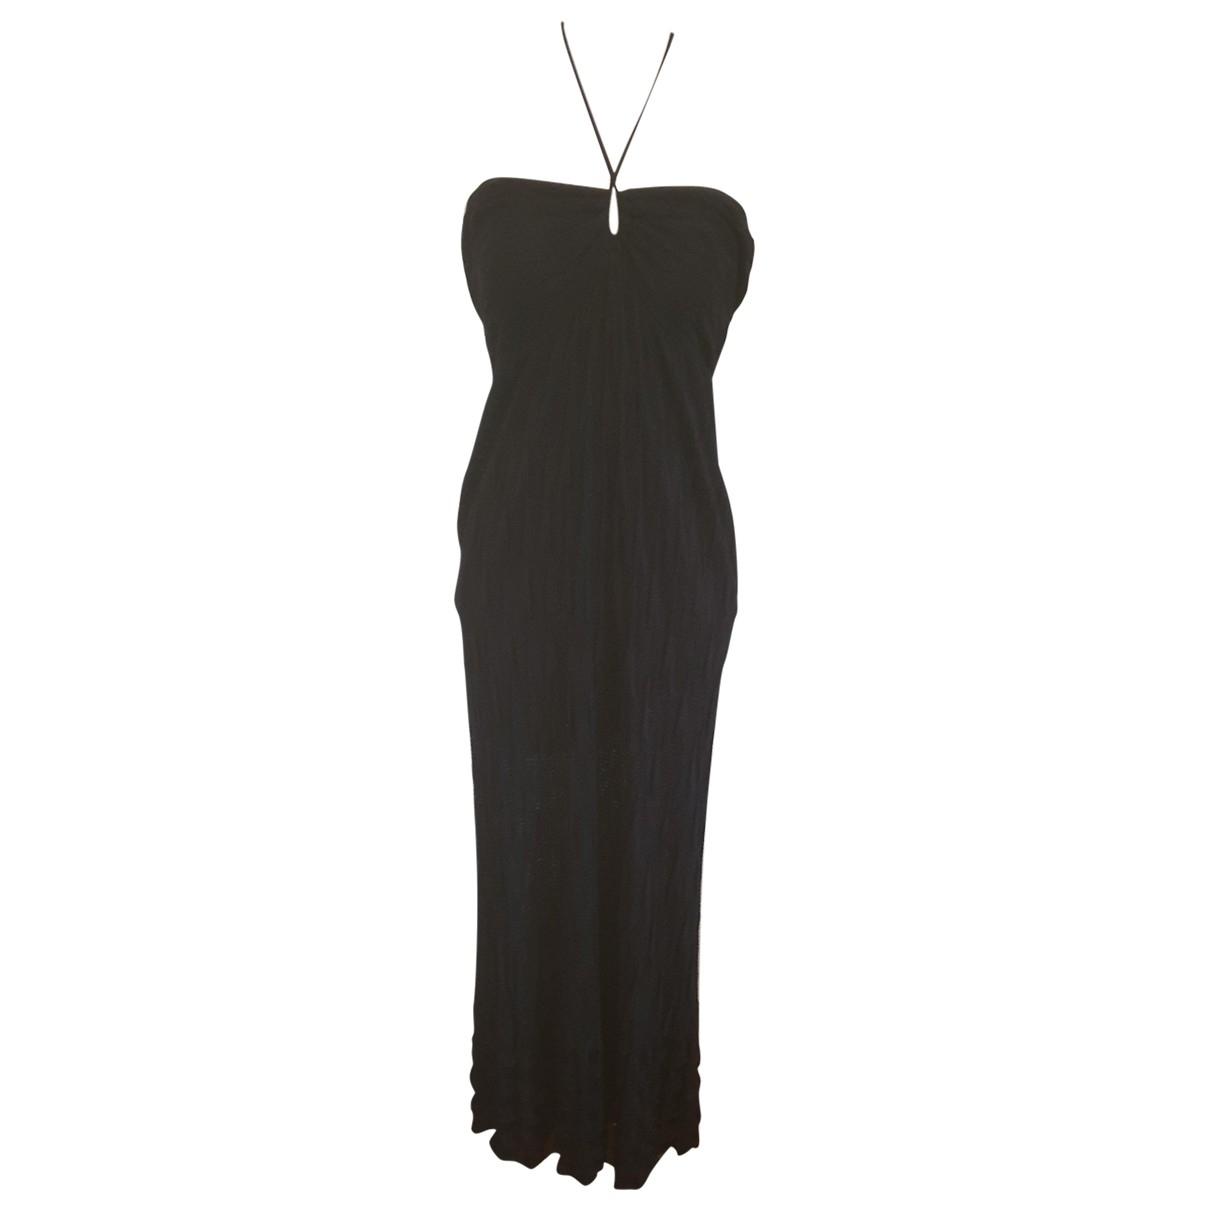 M Missoni \N Black dress for Women 46 IT